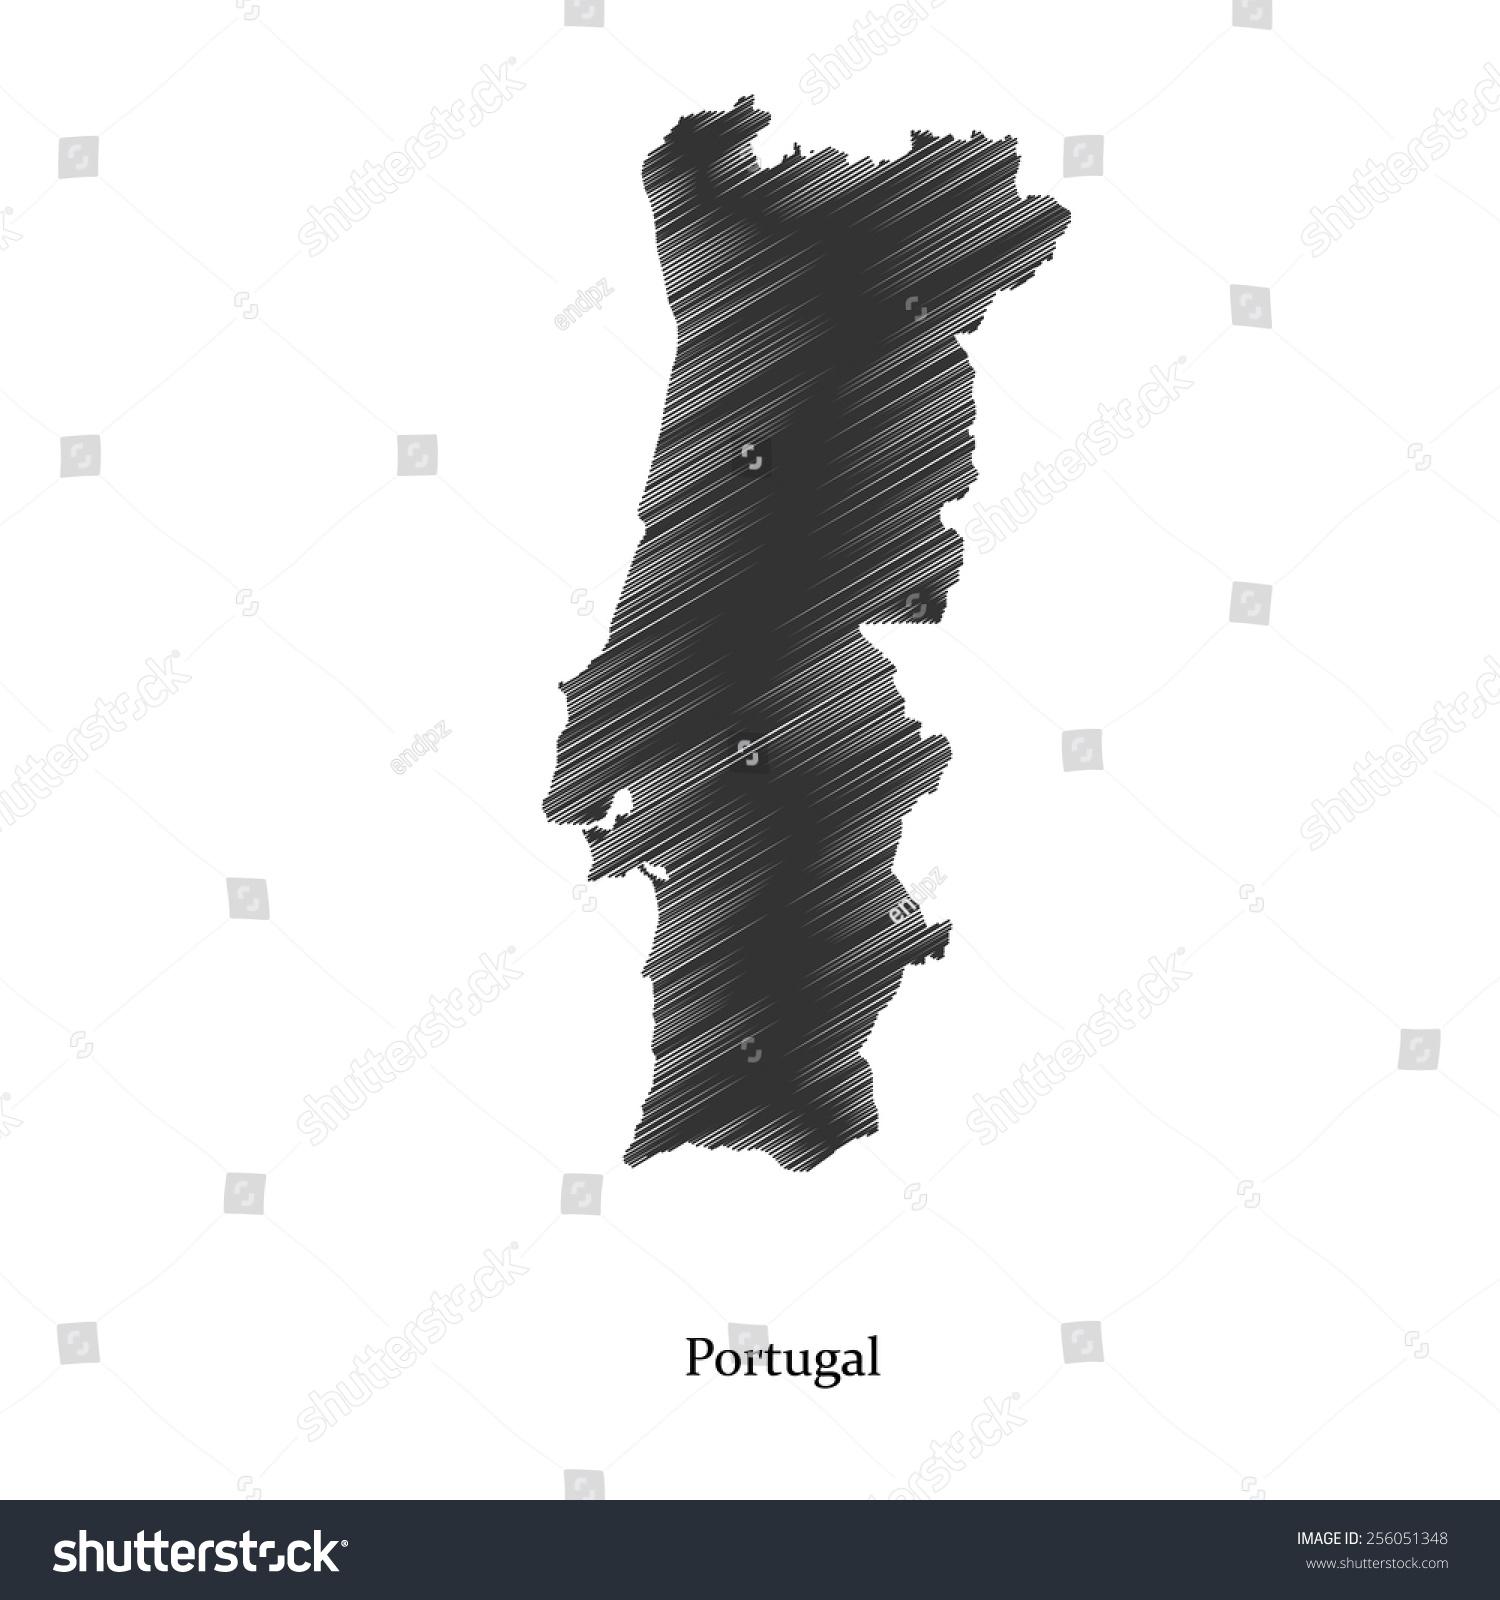 Portugal Map Icon Your Design Concept Stock Vector - Portugal map icon